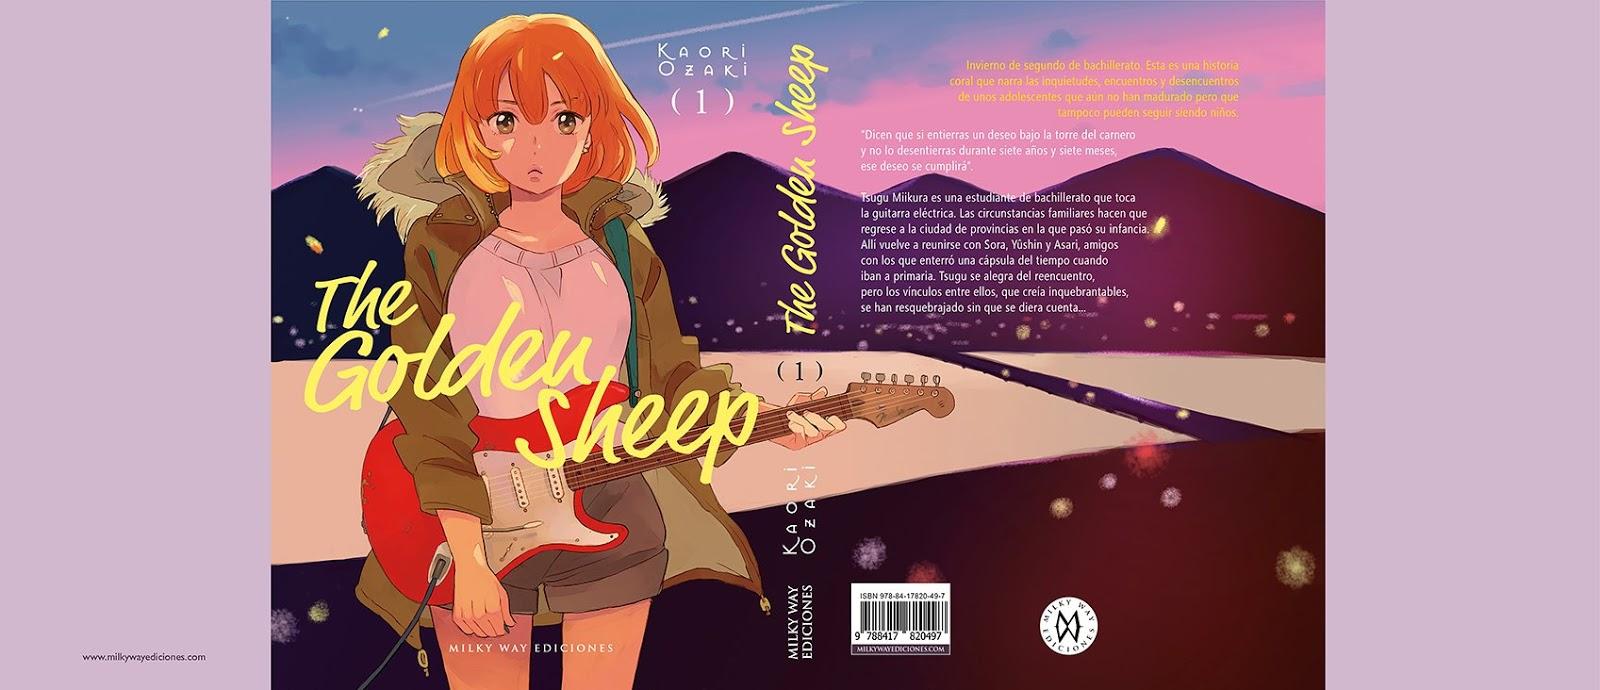 The Golden Sheep, de Kaori Ozaki